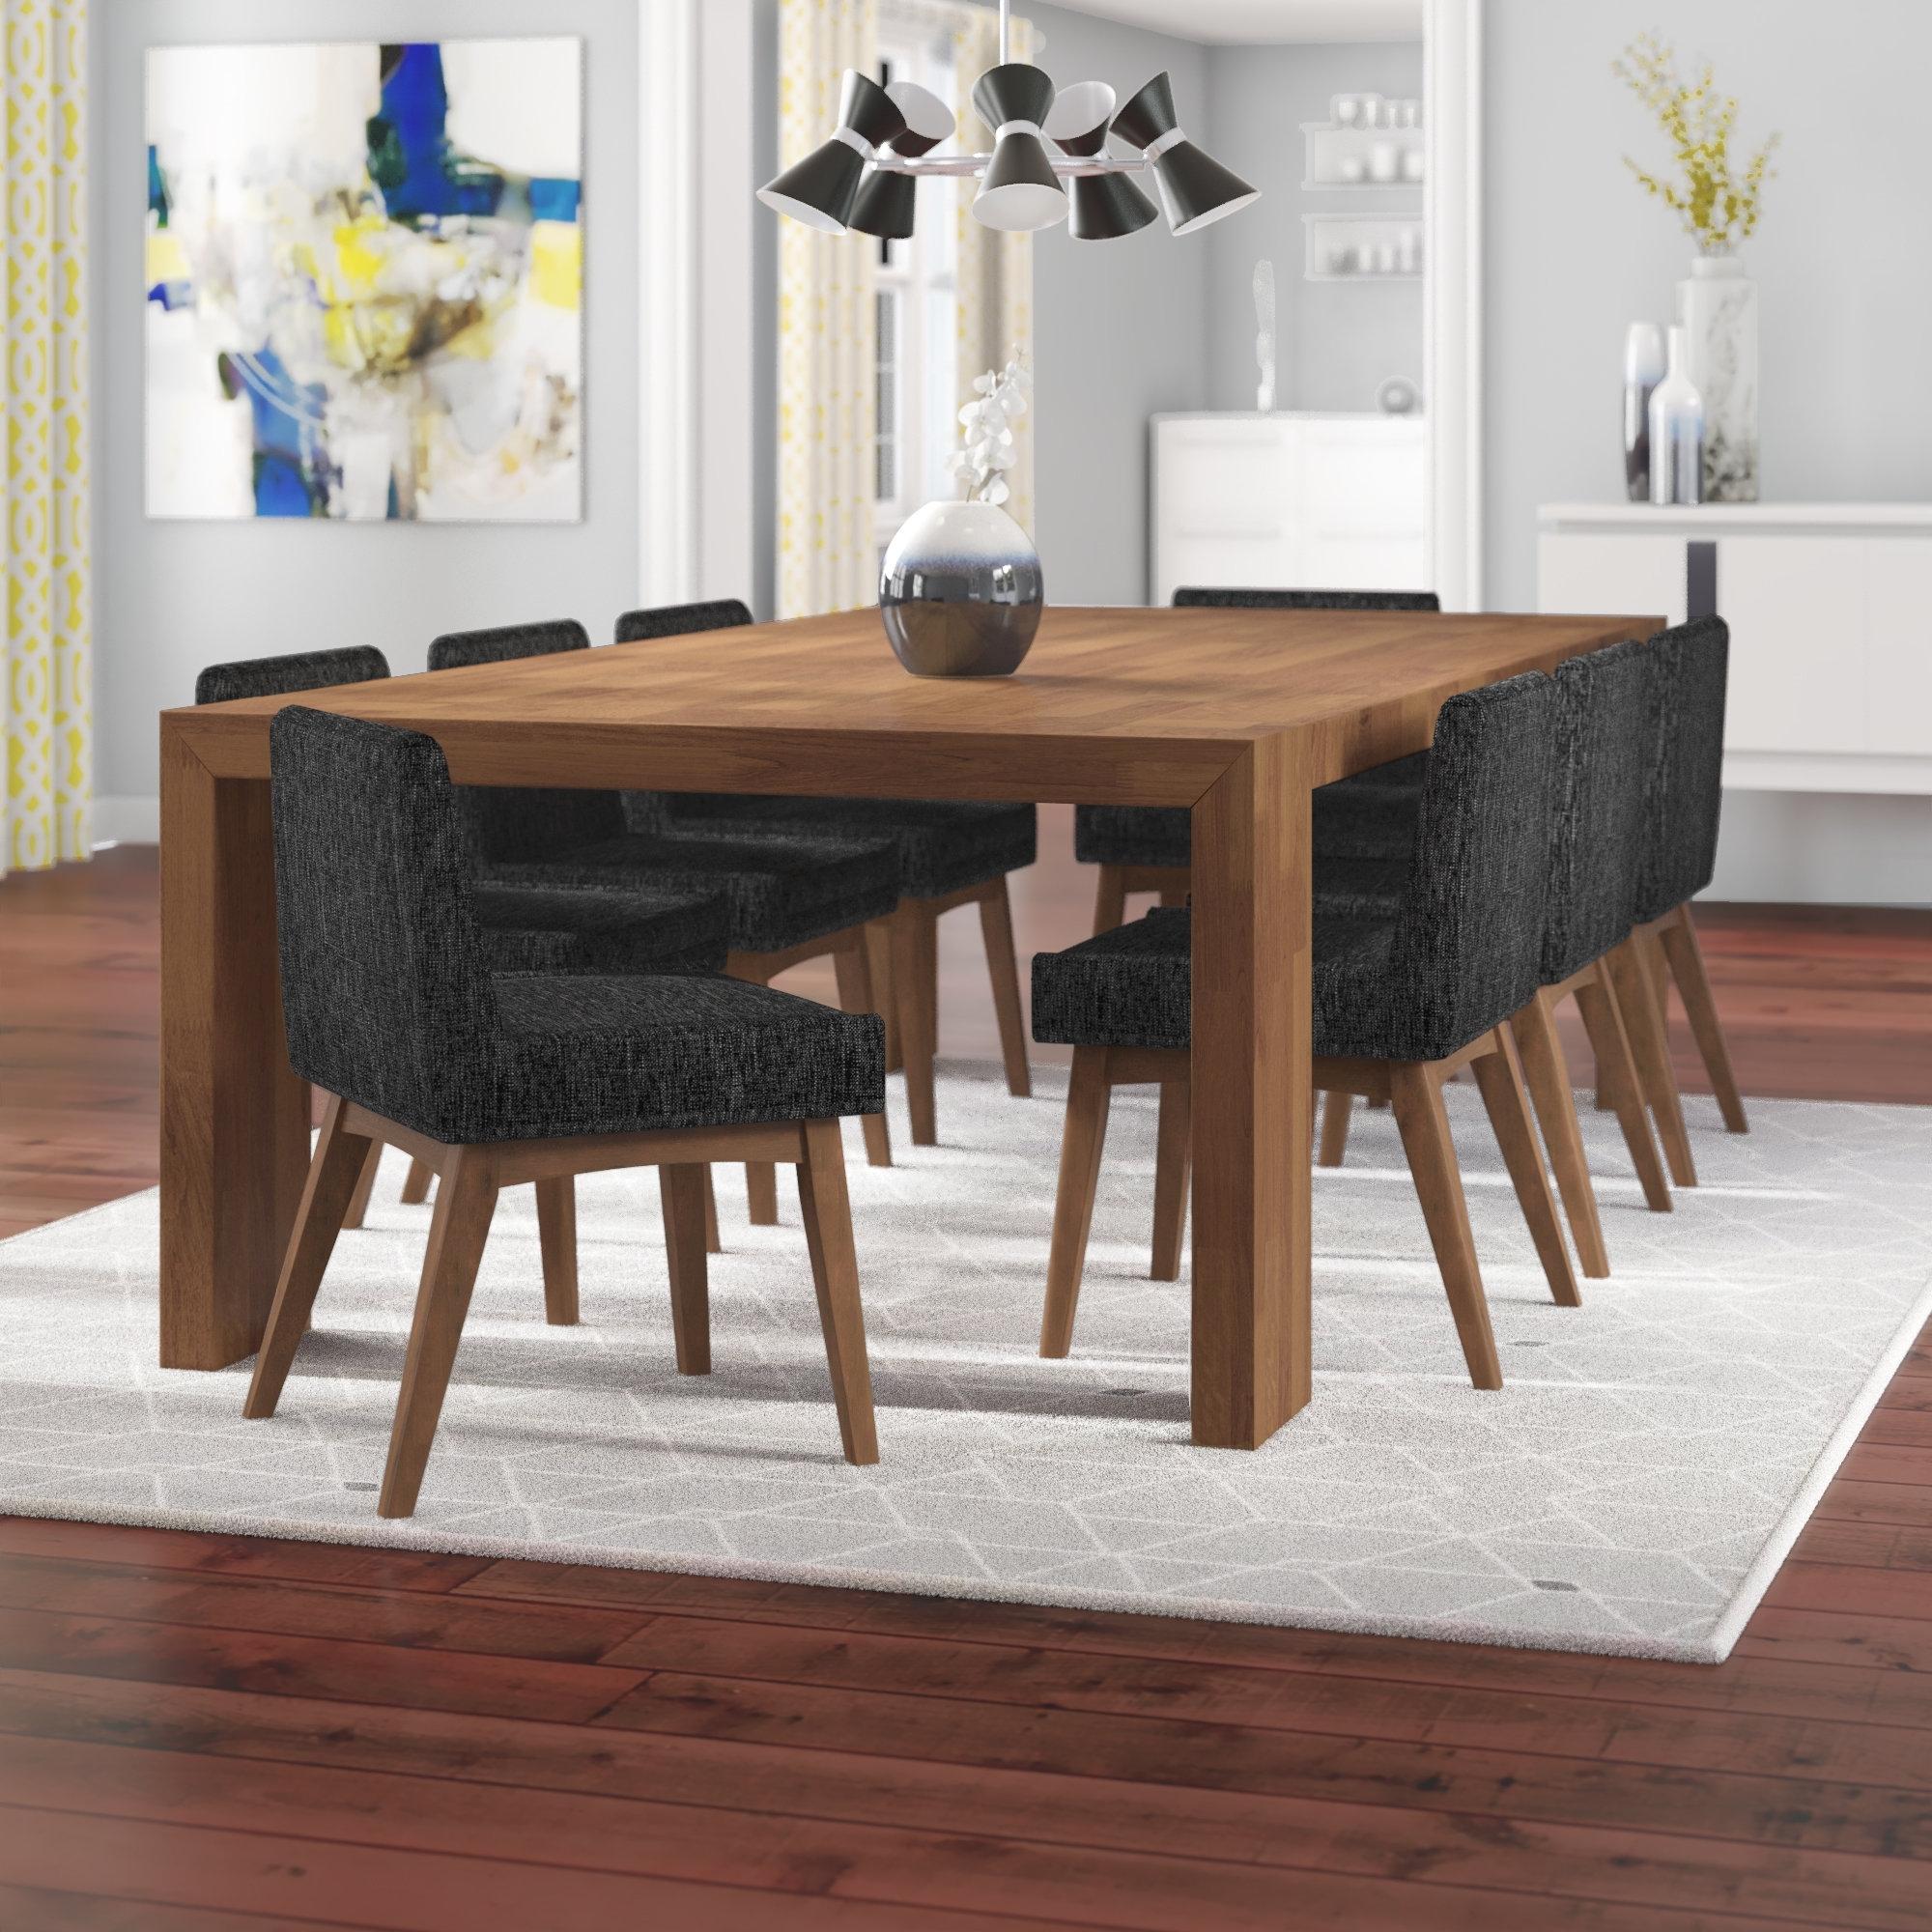 Preferred Corrigan Studio Crume 9 Piece Dining Set (View 9 of 25)